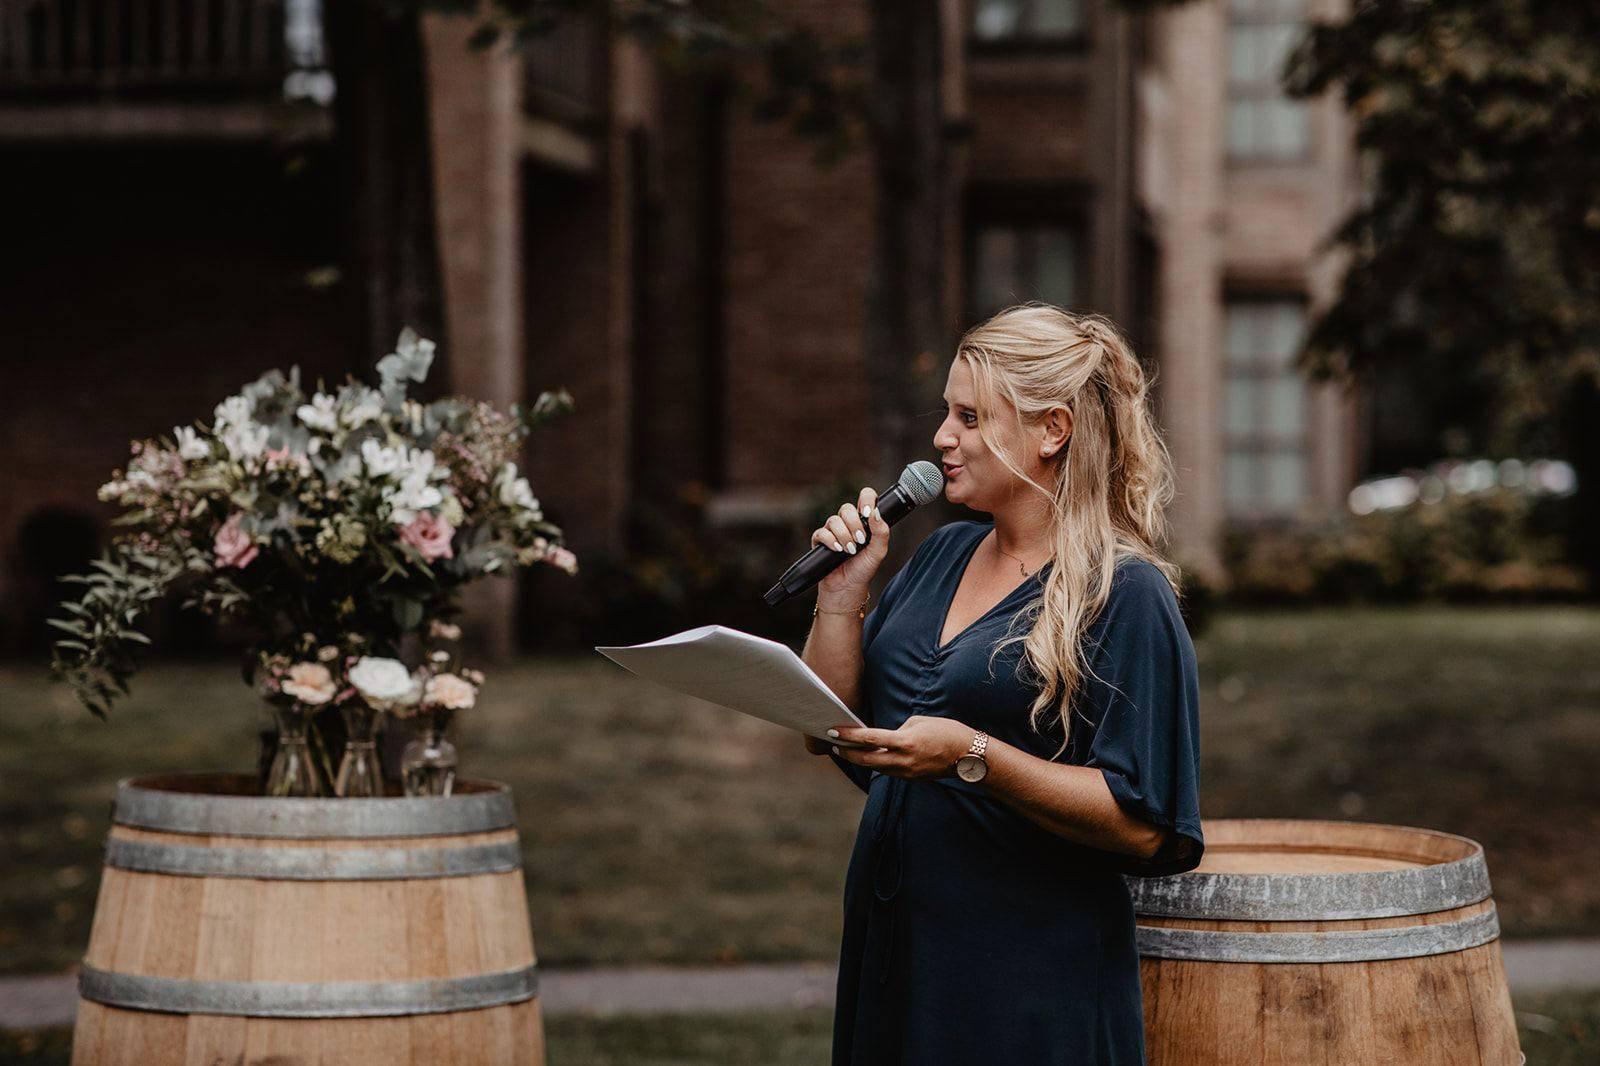 Event'L Ceremonie - Fotograaf Anneleen Jegers 5 - House of Weddings